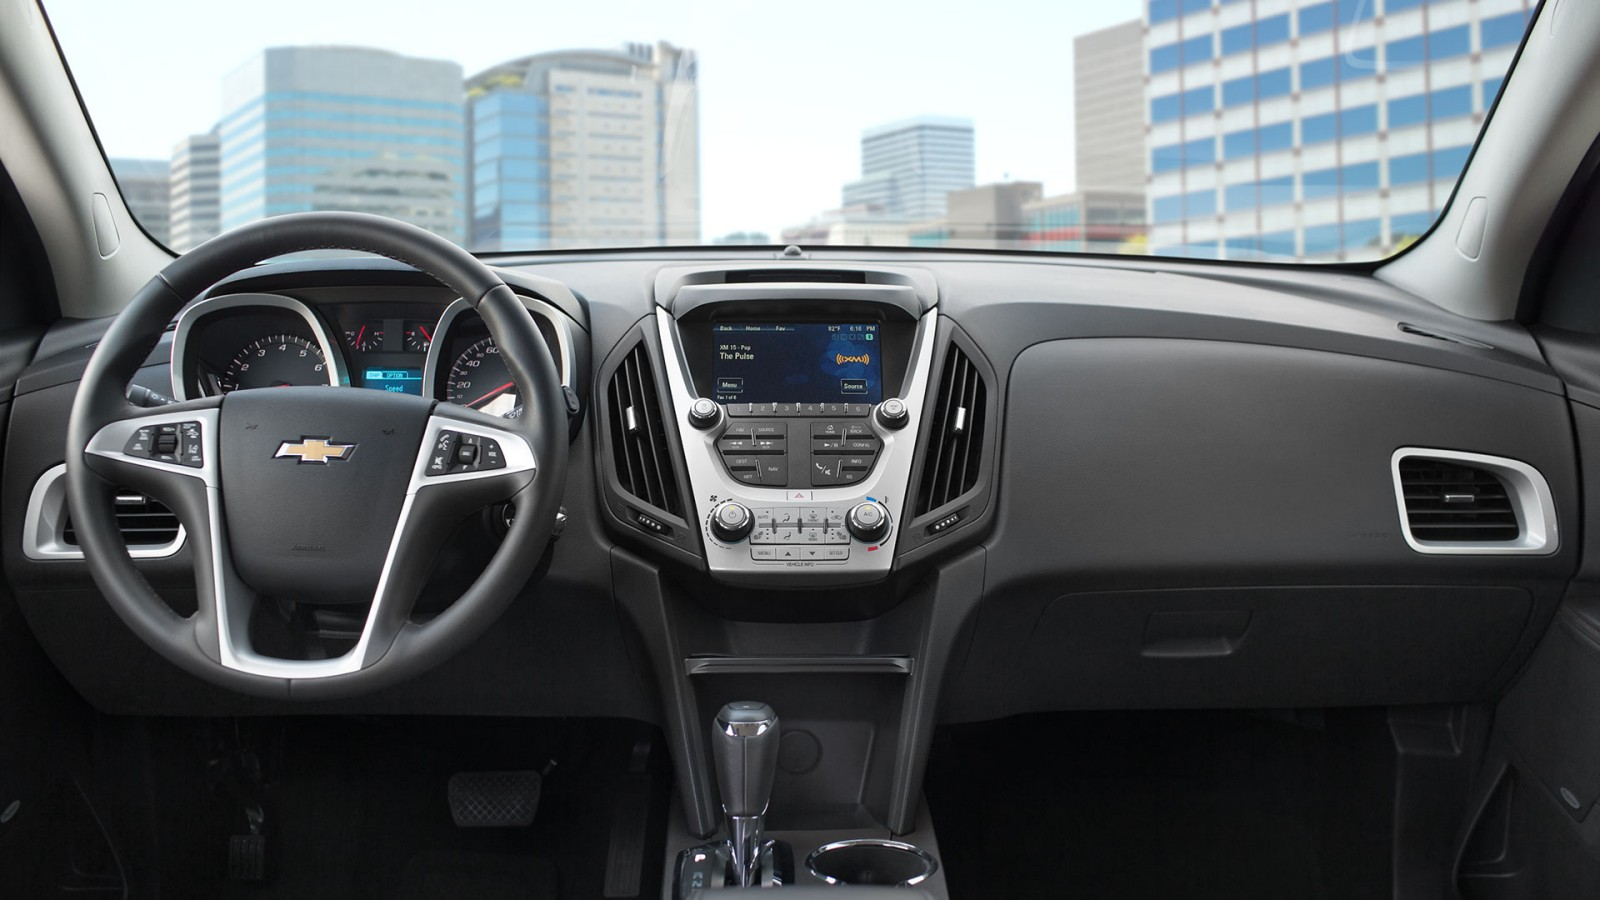 New Chevrolet Equinox Interior main image